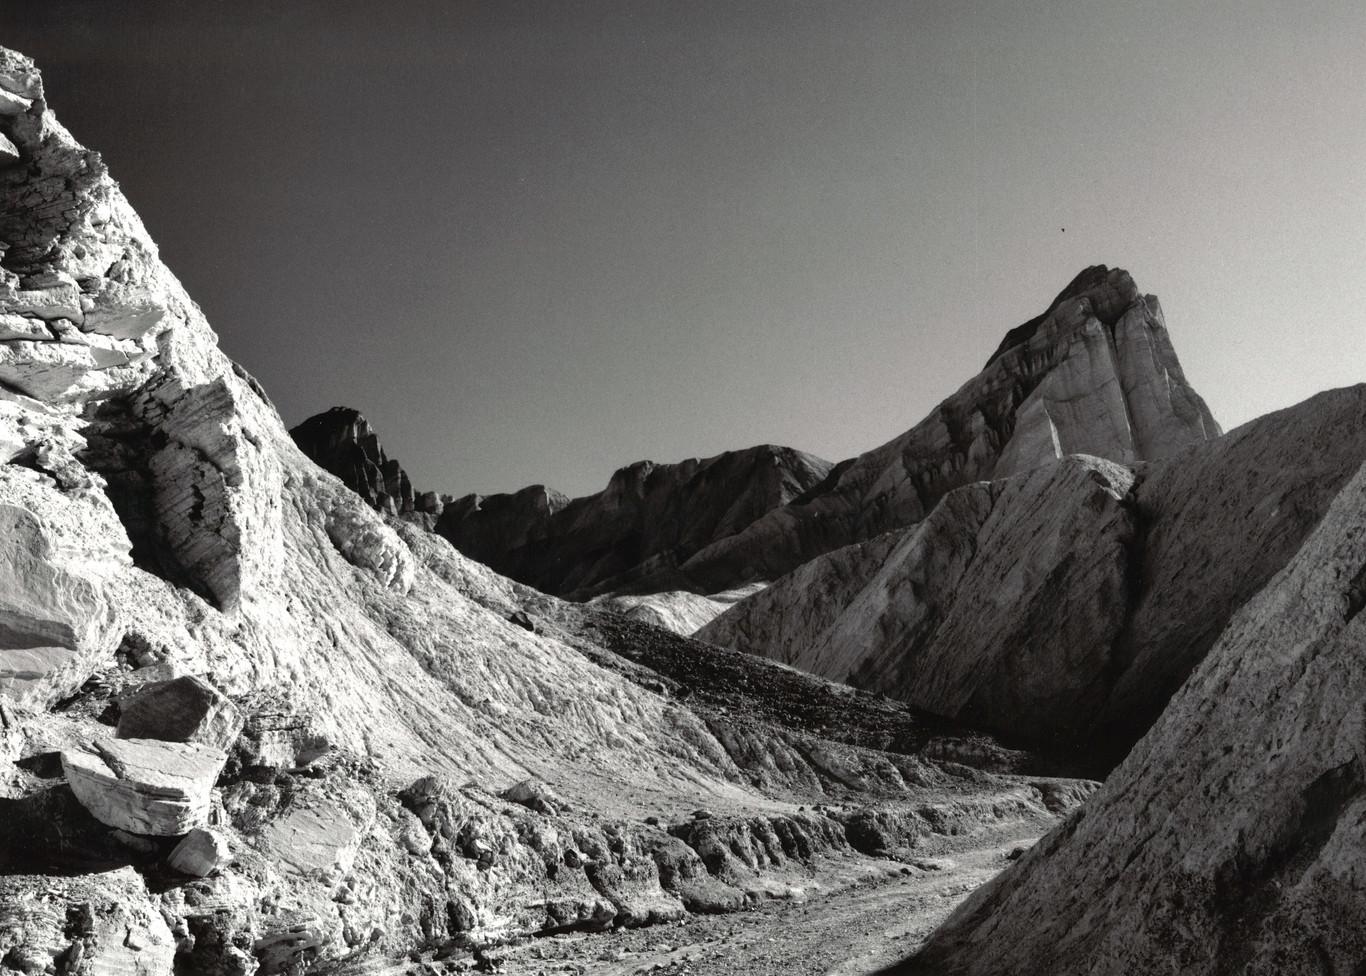 Golden Canyon - Death Valley